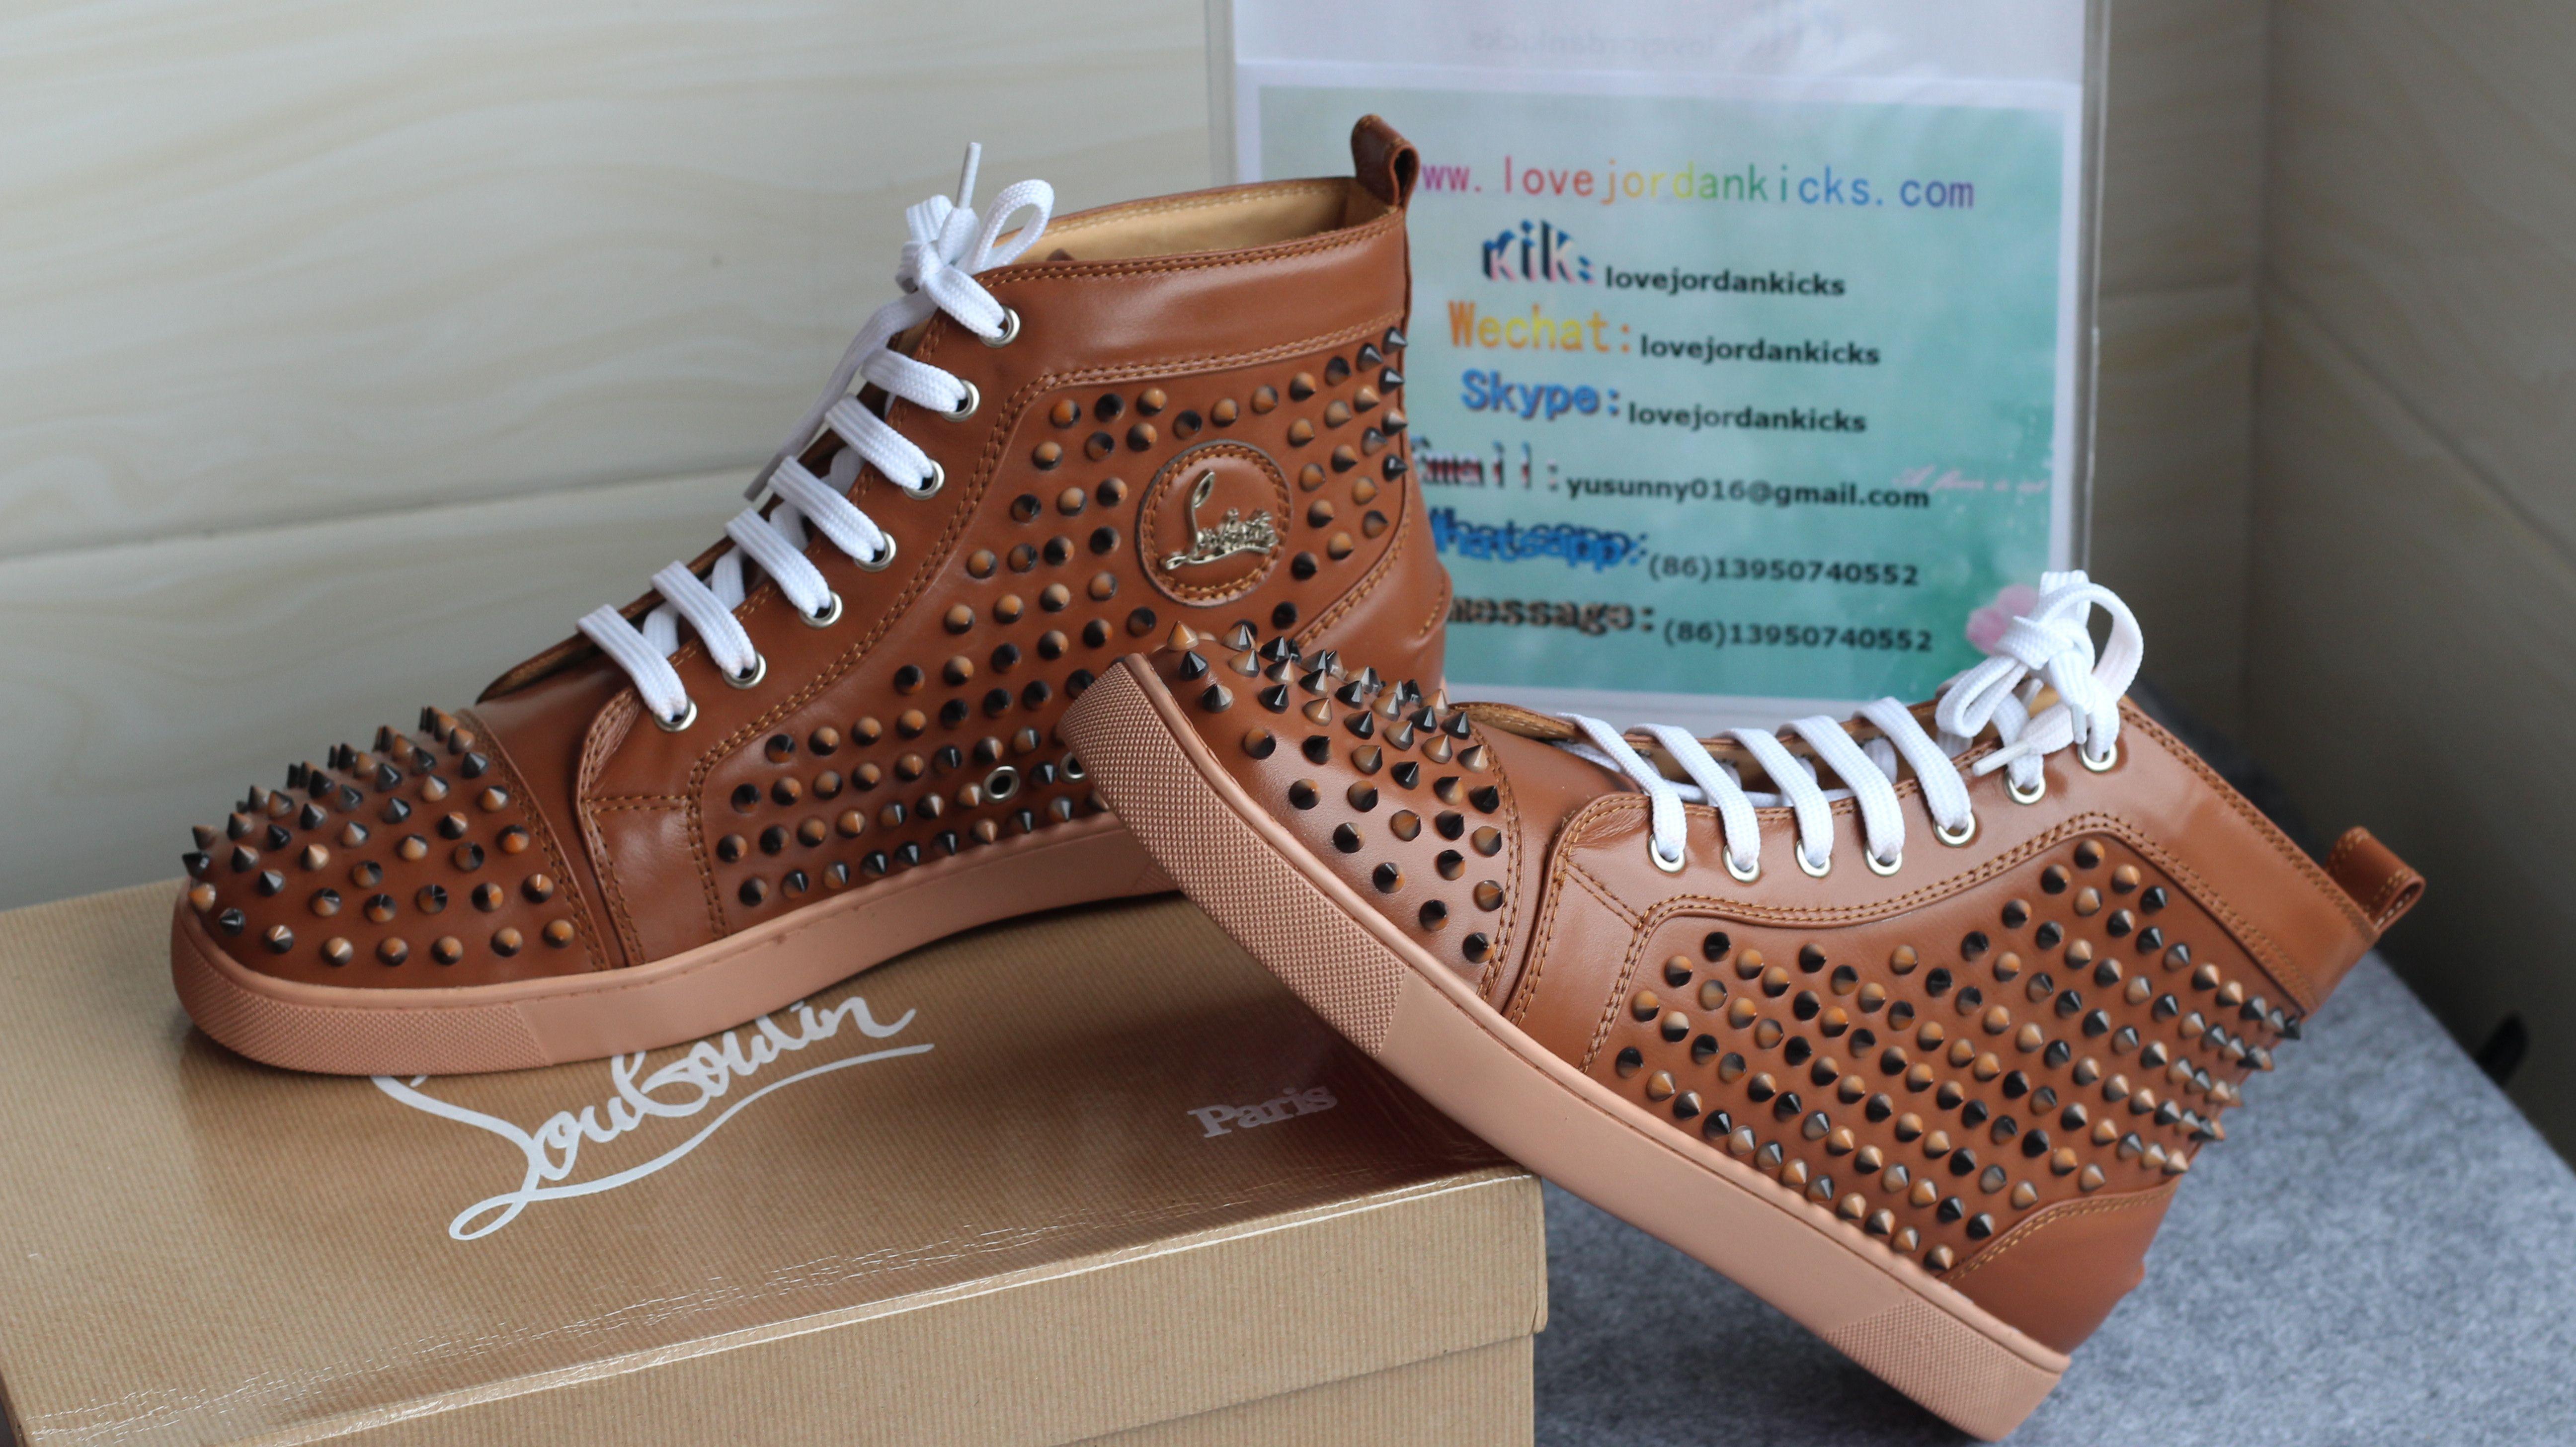 sale retailer ebf83 71a4a louis spikes flat python from www.lovejordankicks.com ...